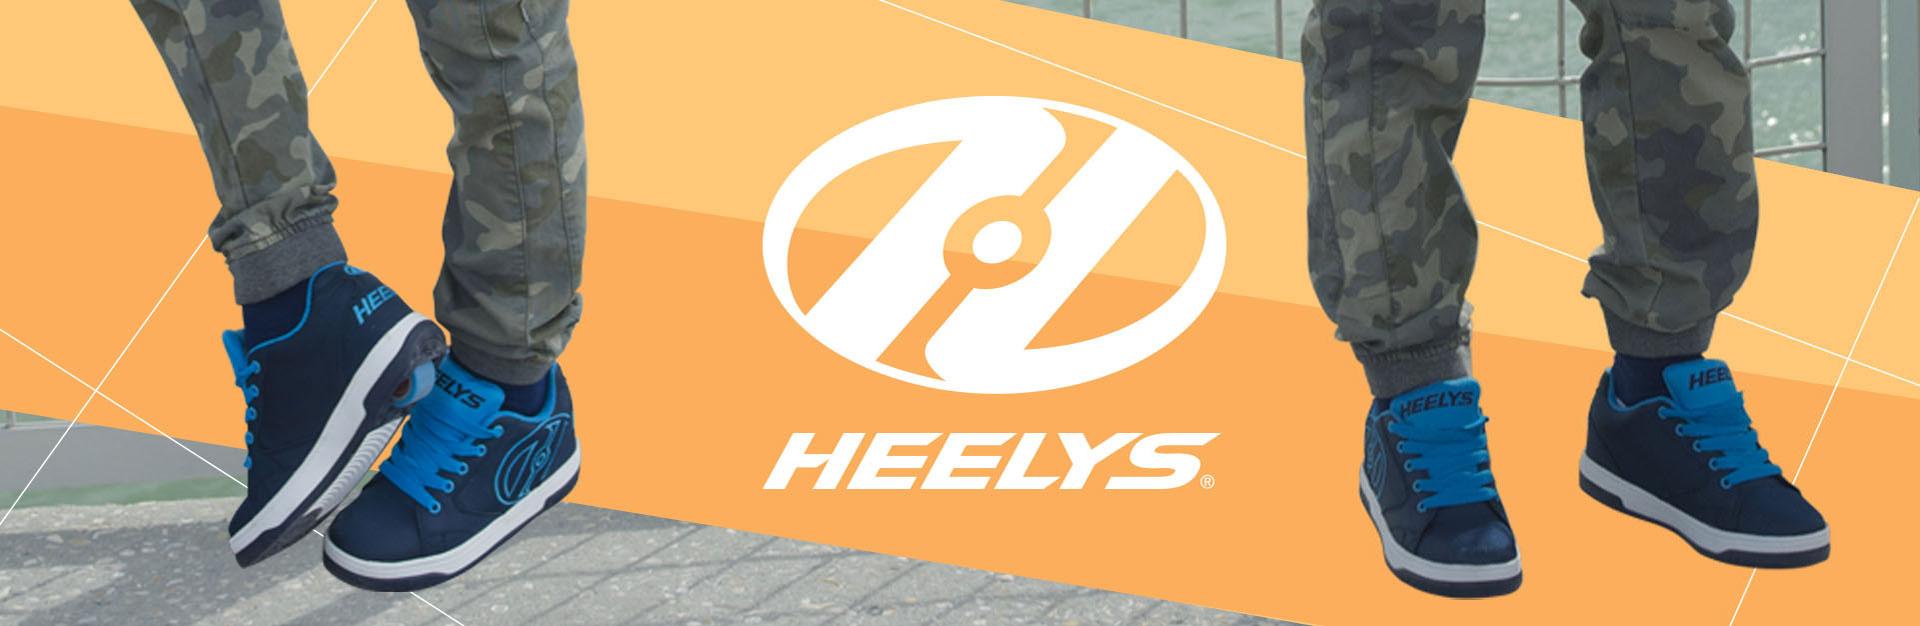 Heelys-SS17-February-Assets-Web-Full-Width-Slider---Propel-Navy-Ballistic